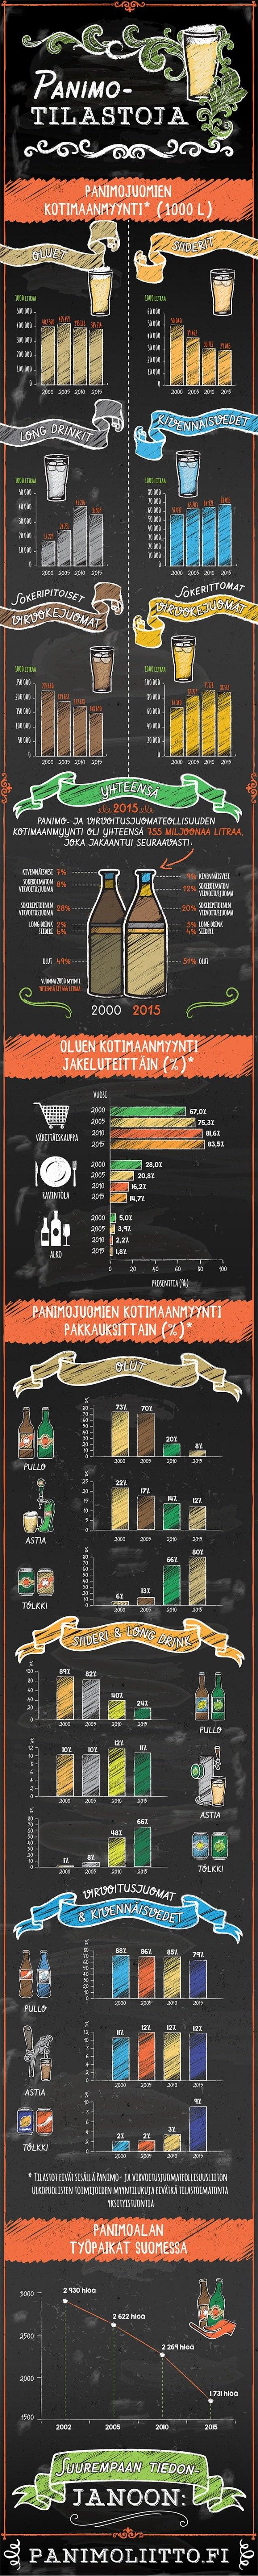 Panimon tilastoja Infograafi by DigiPeople Studio